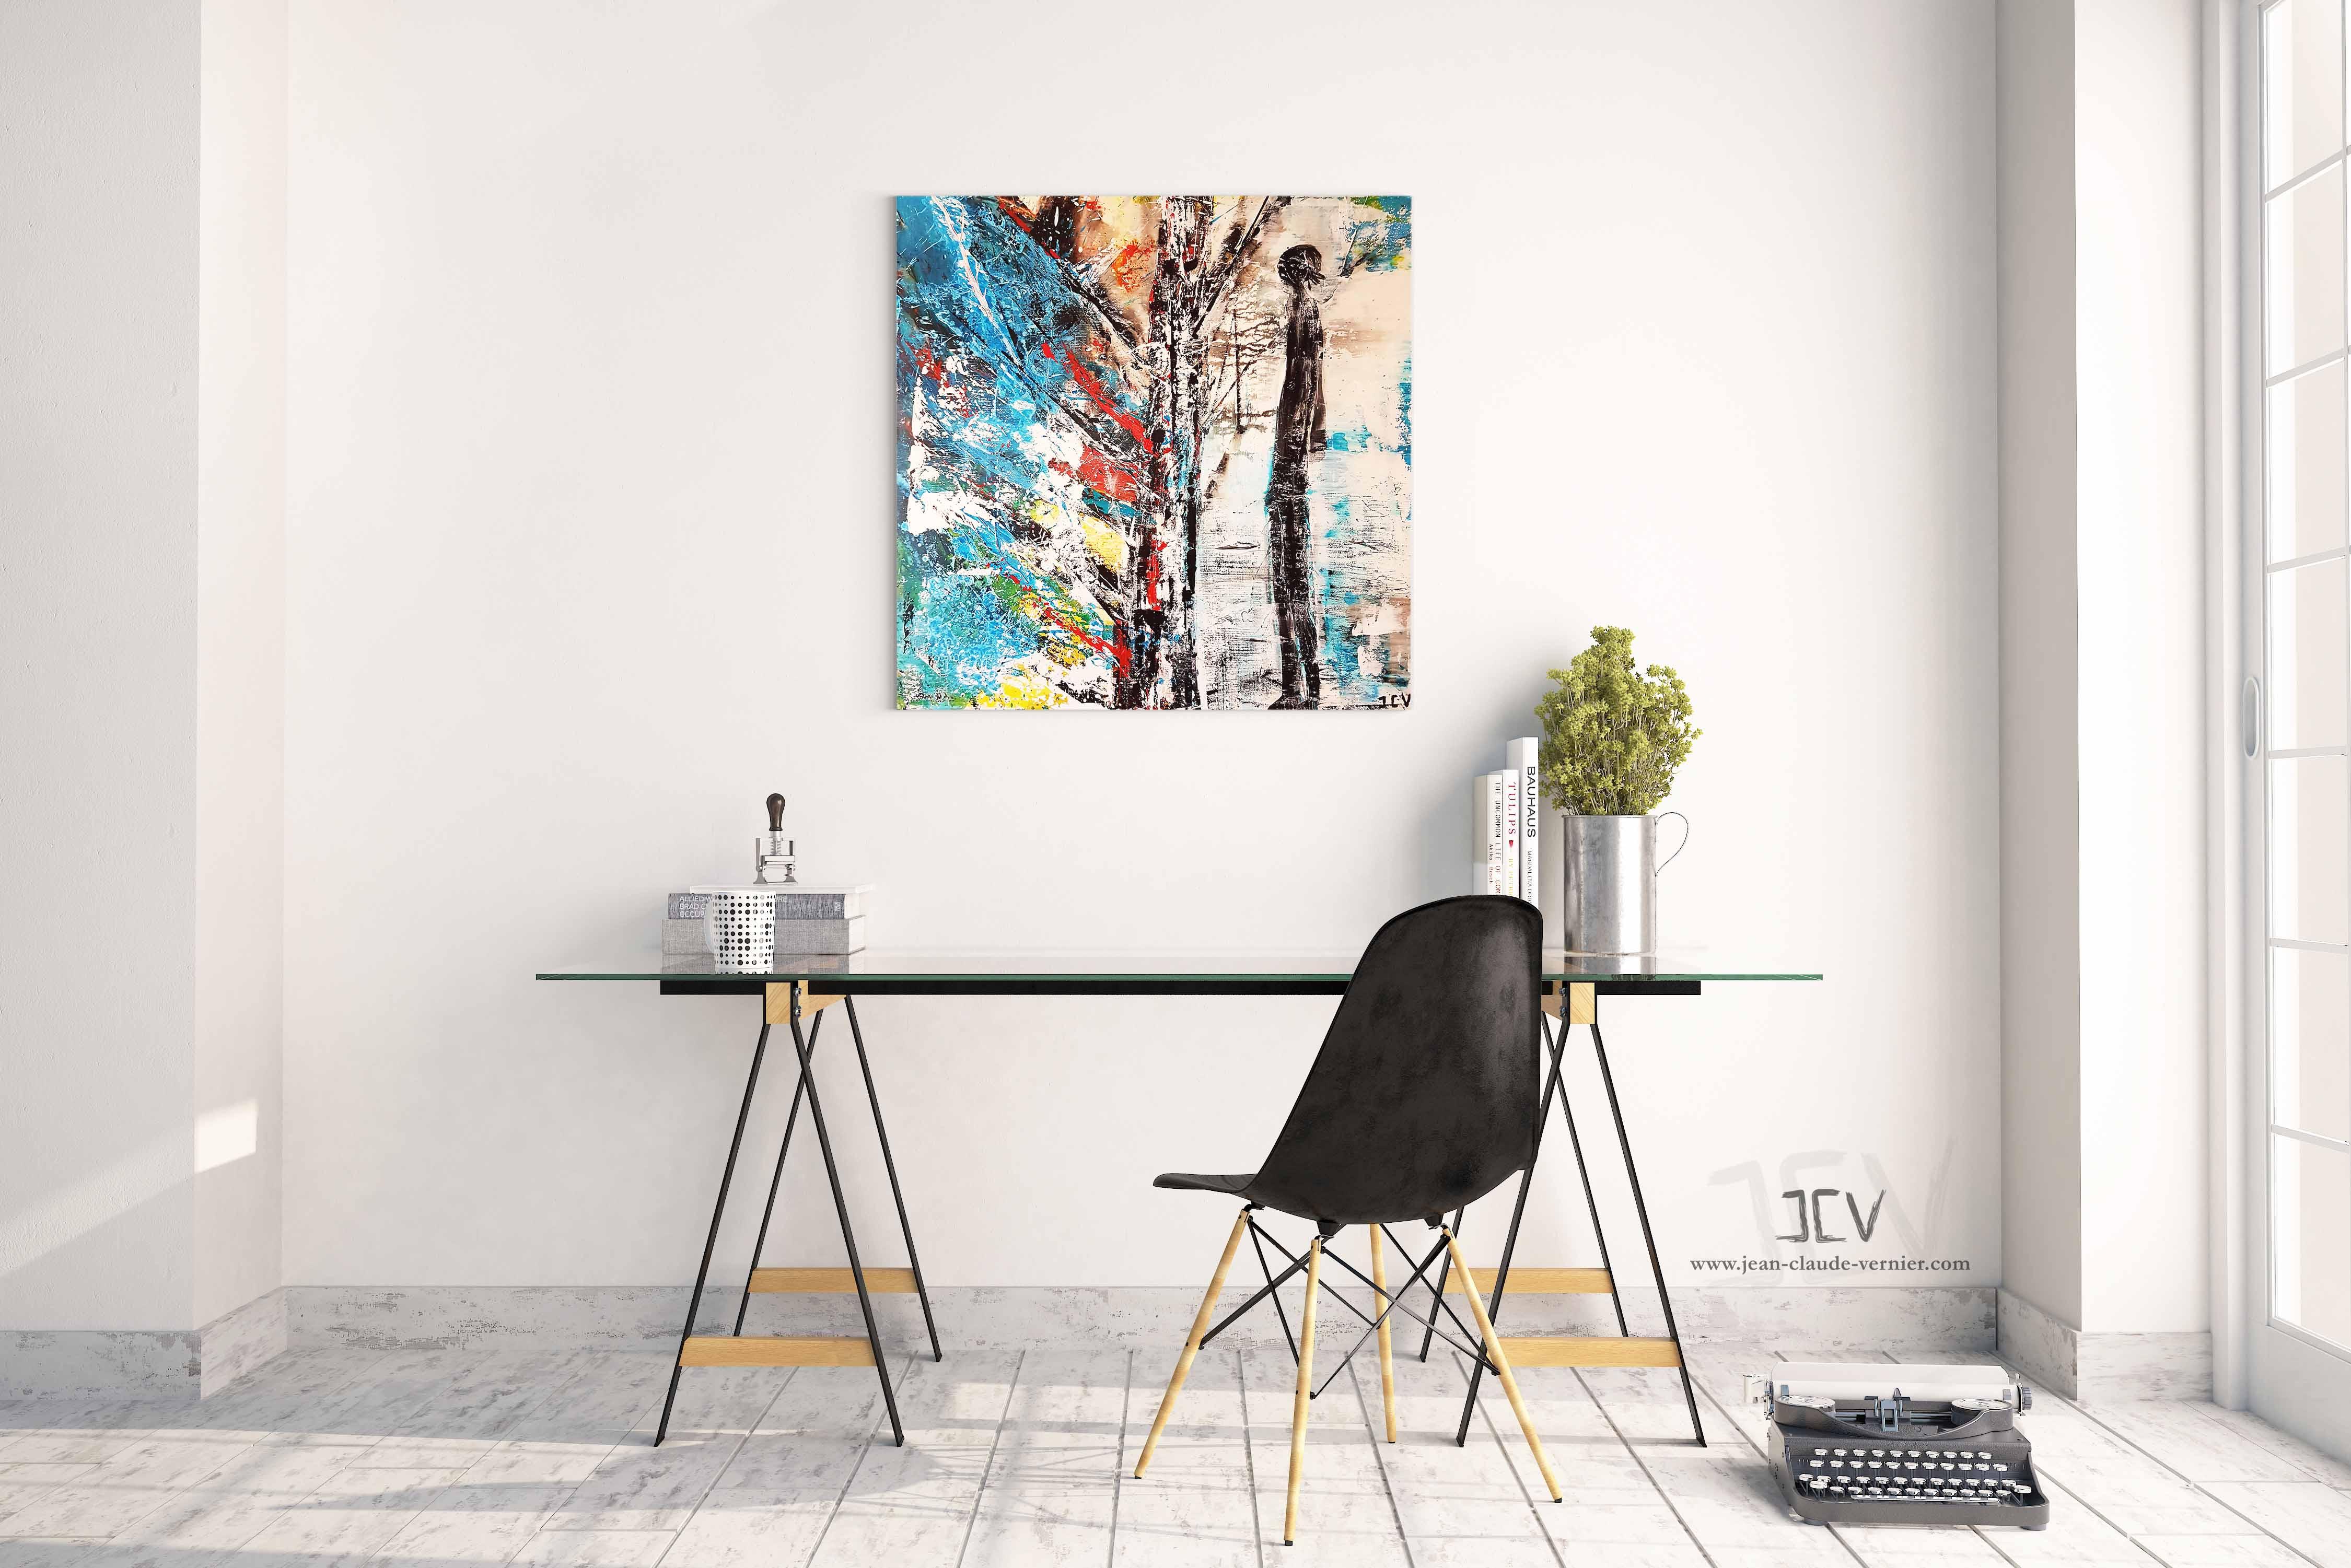 Le Mur - Jean-Claude Vernier, Artiste Peintre Contemporain